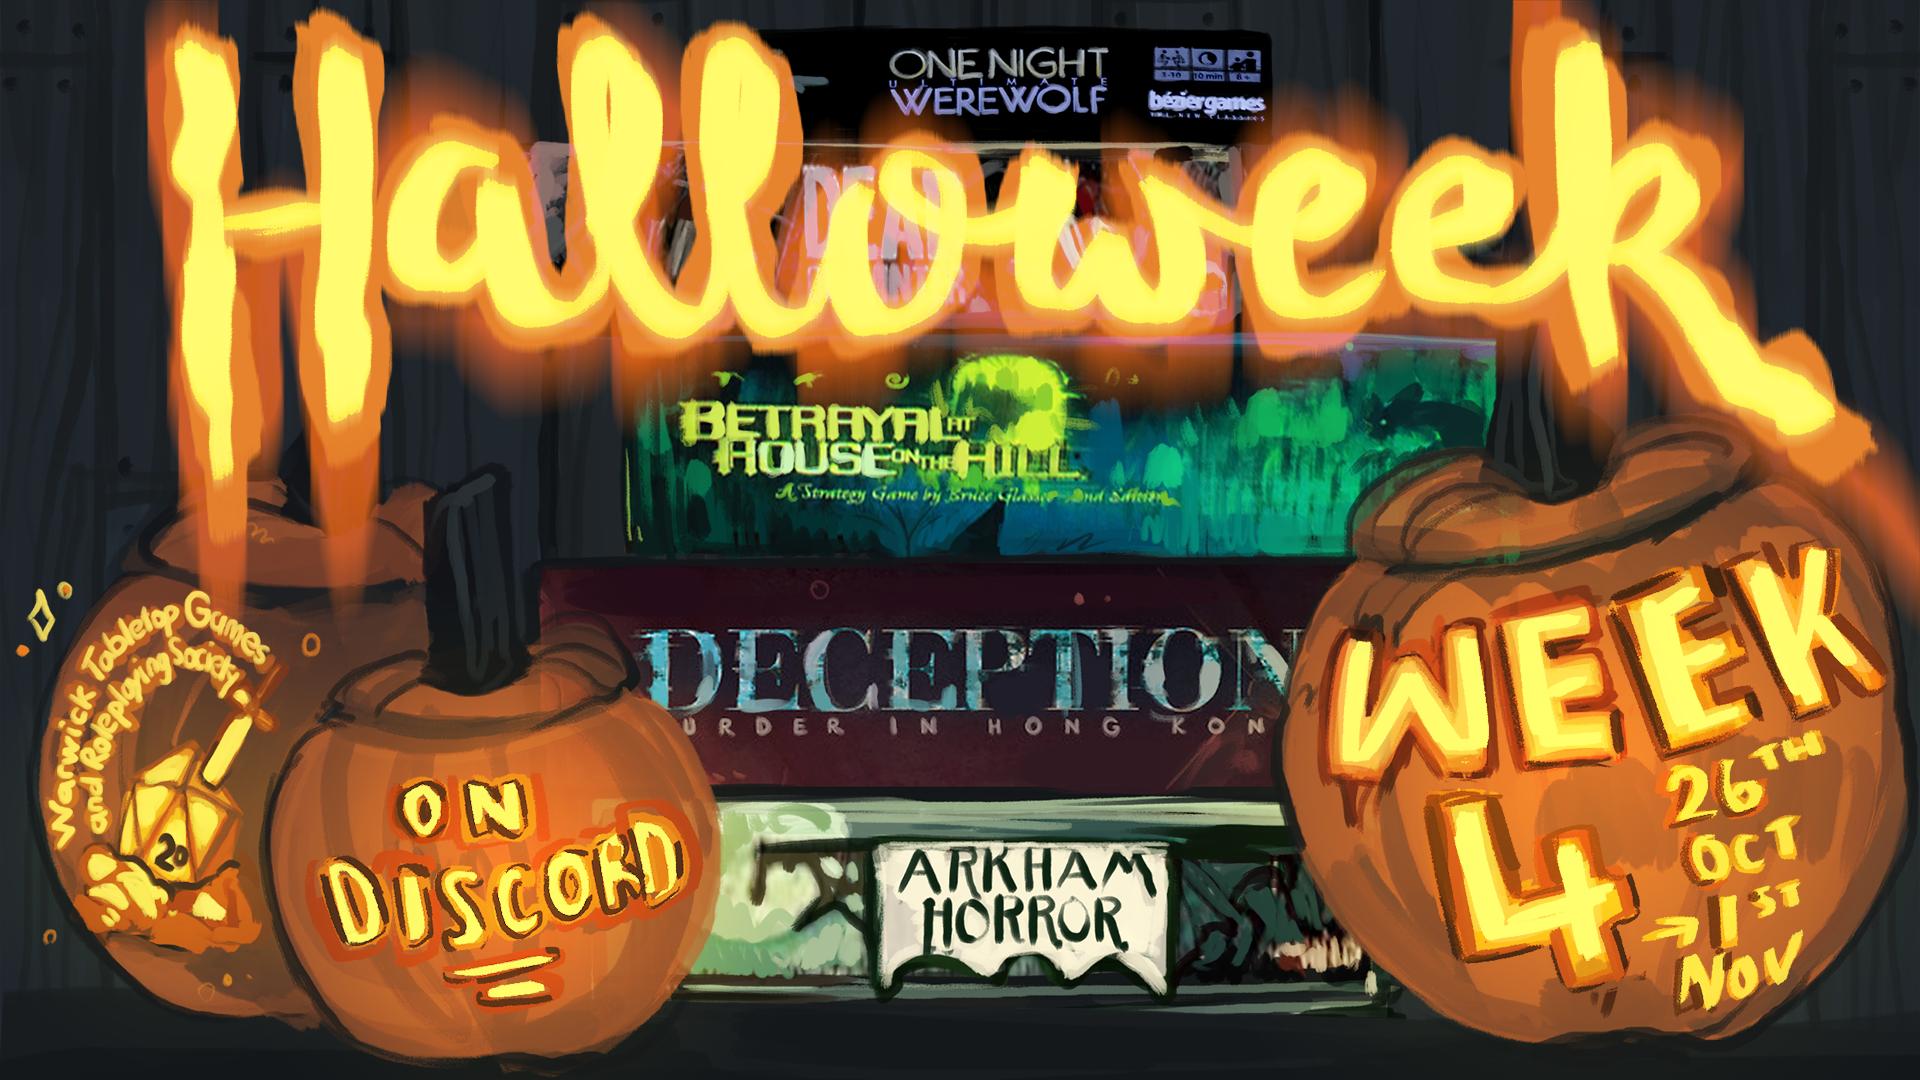 halloweek poster